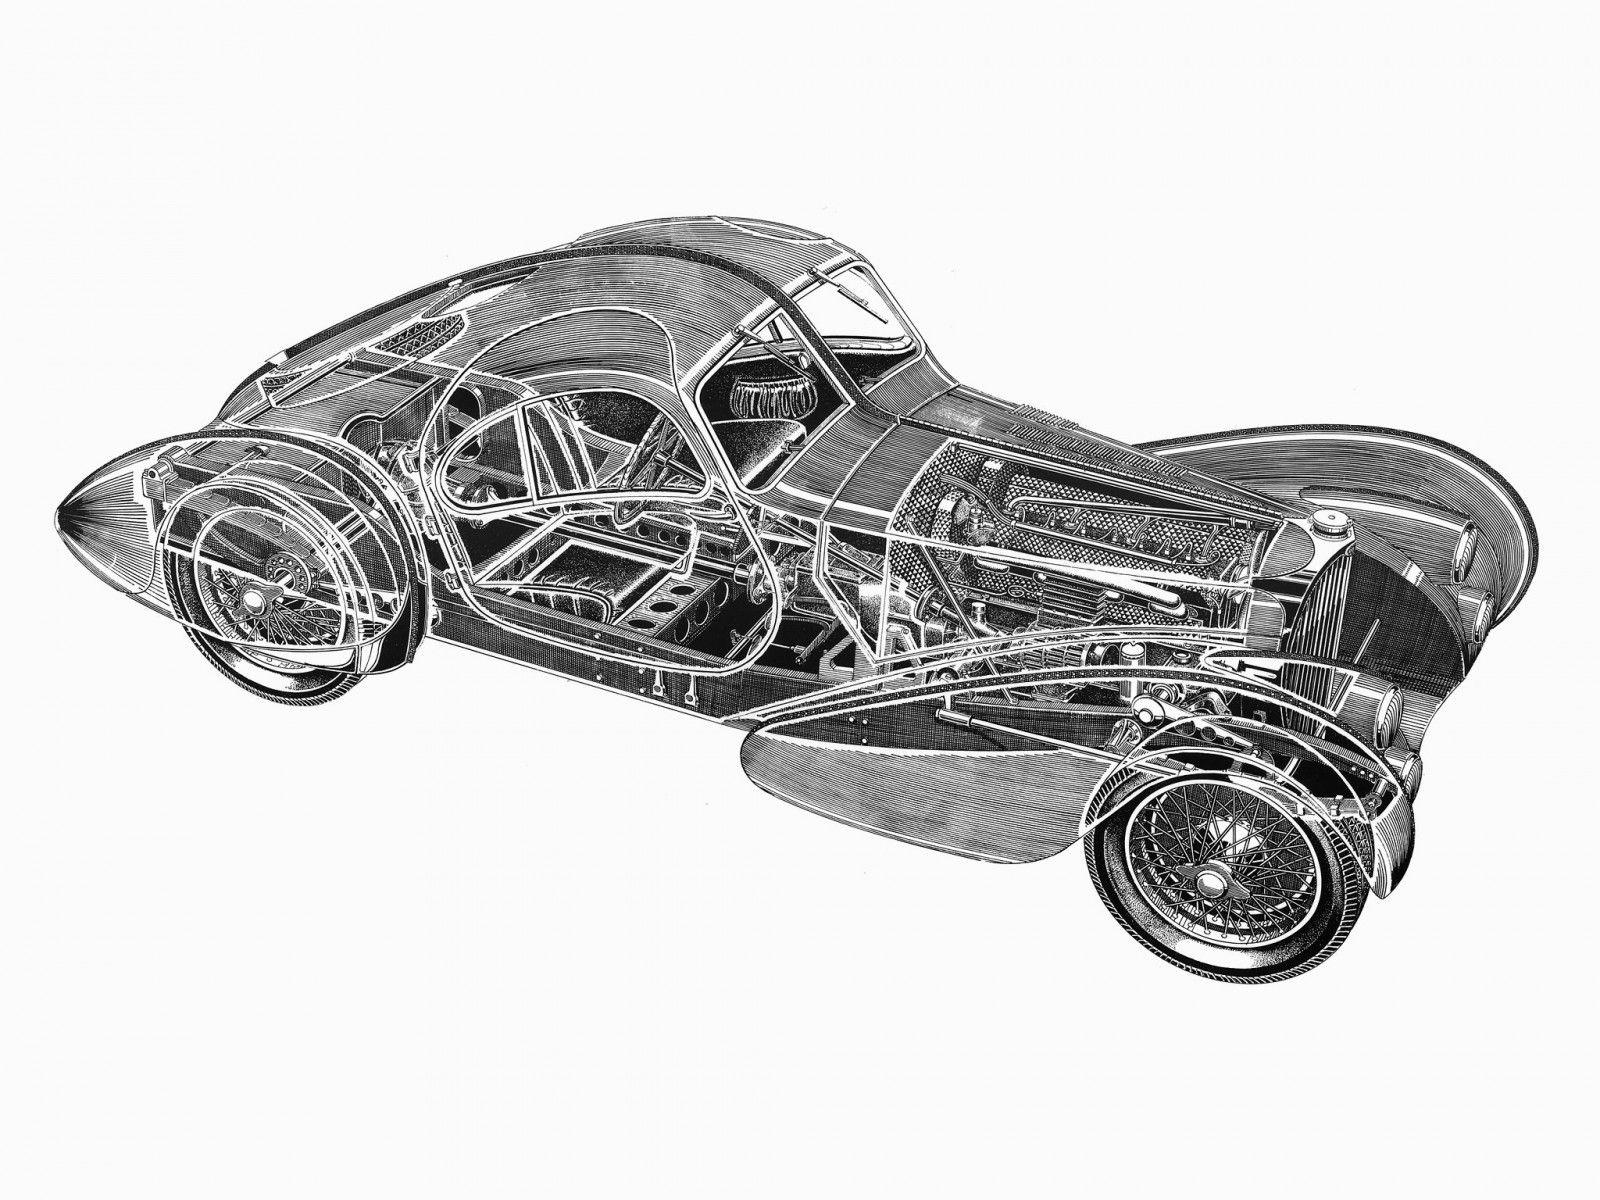 Bugatti Type 57sc Cutaway Wallpaper Bugatti Bugatti Type 57 Cutaway